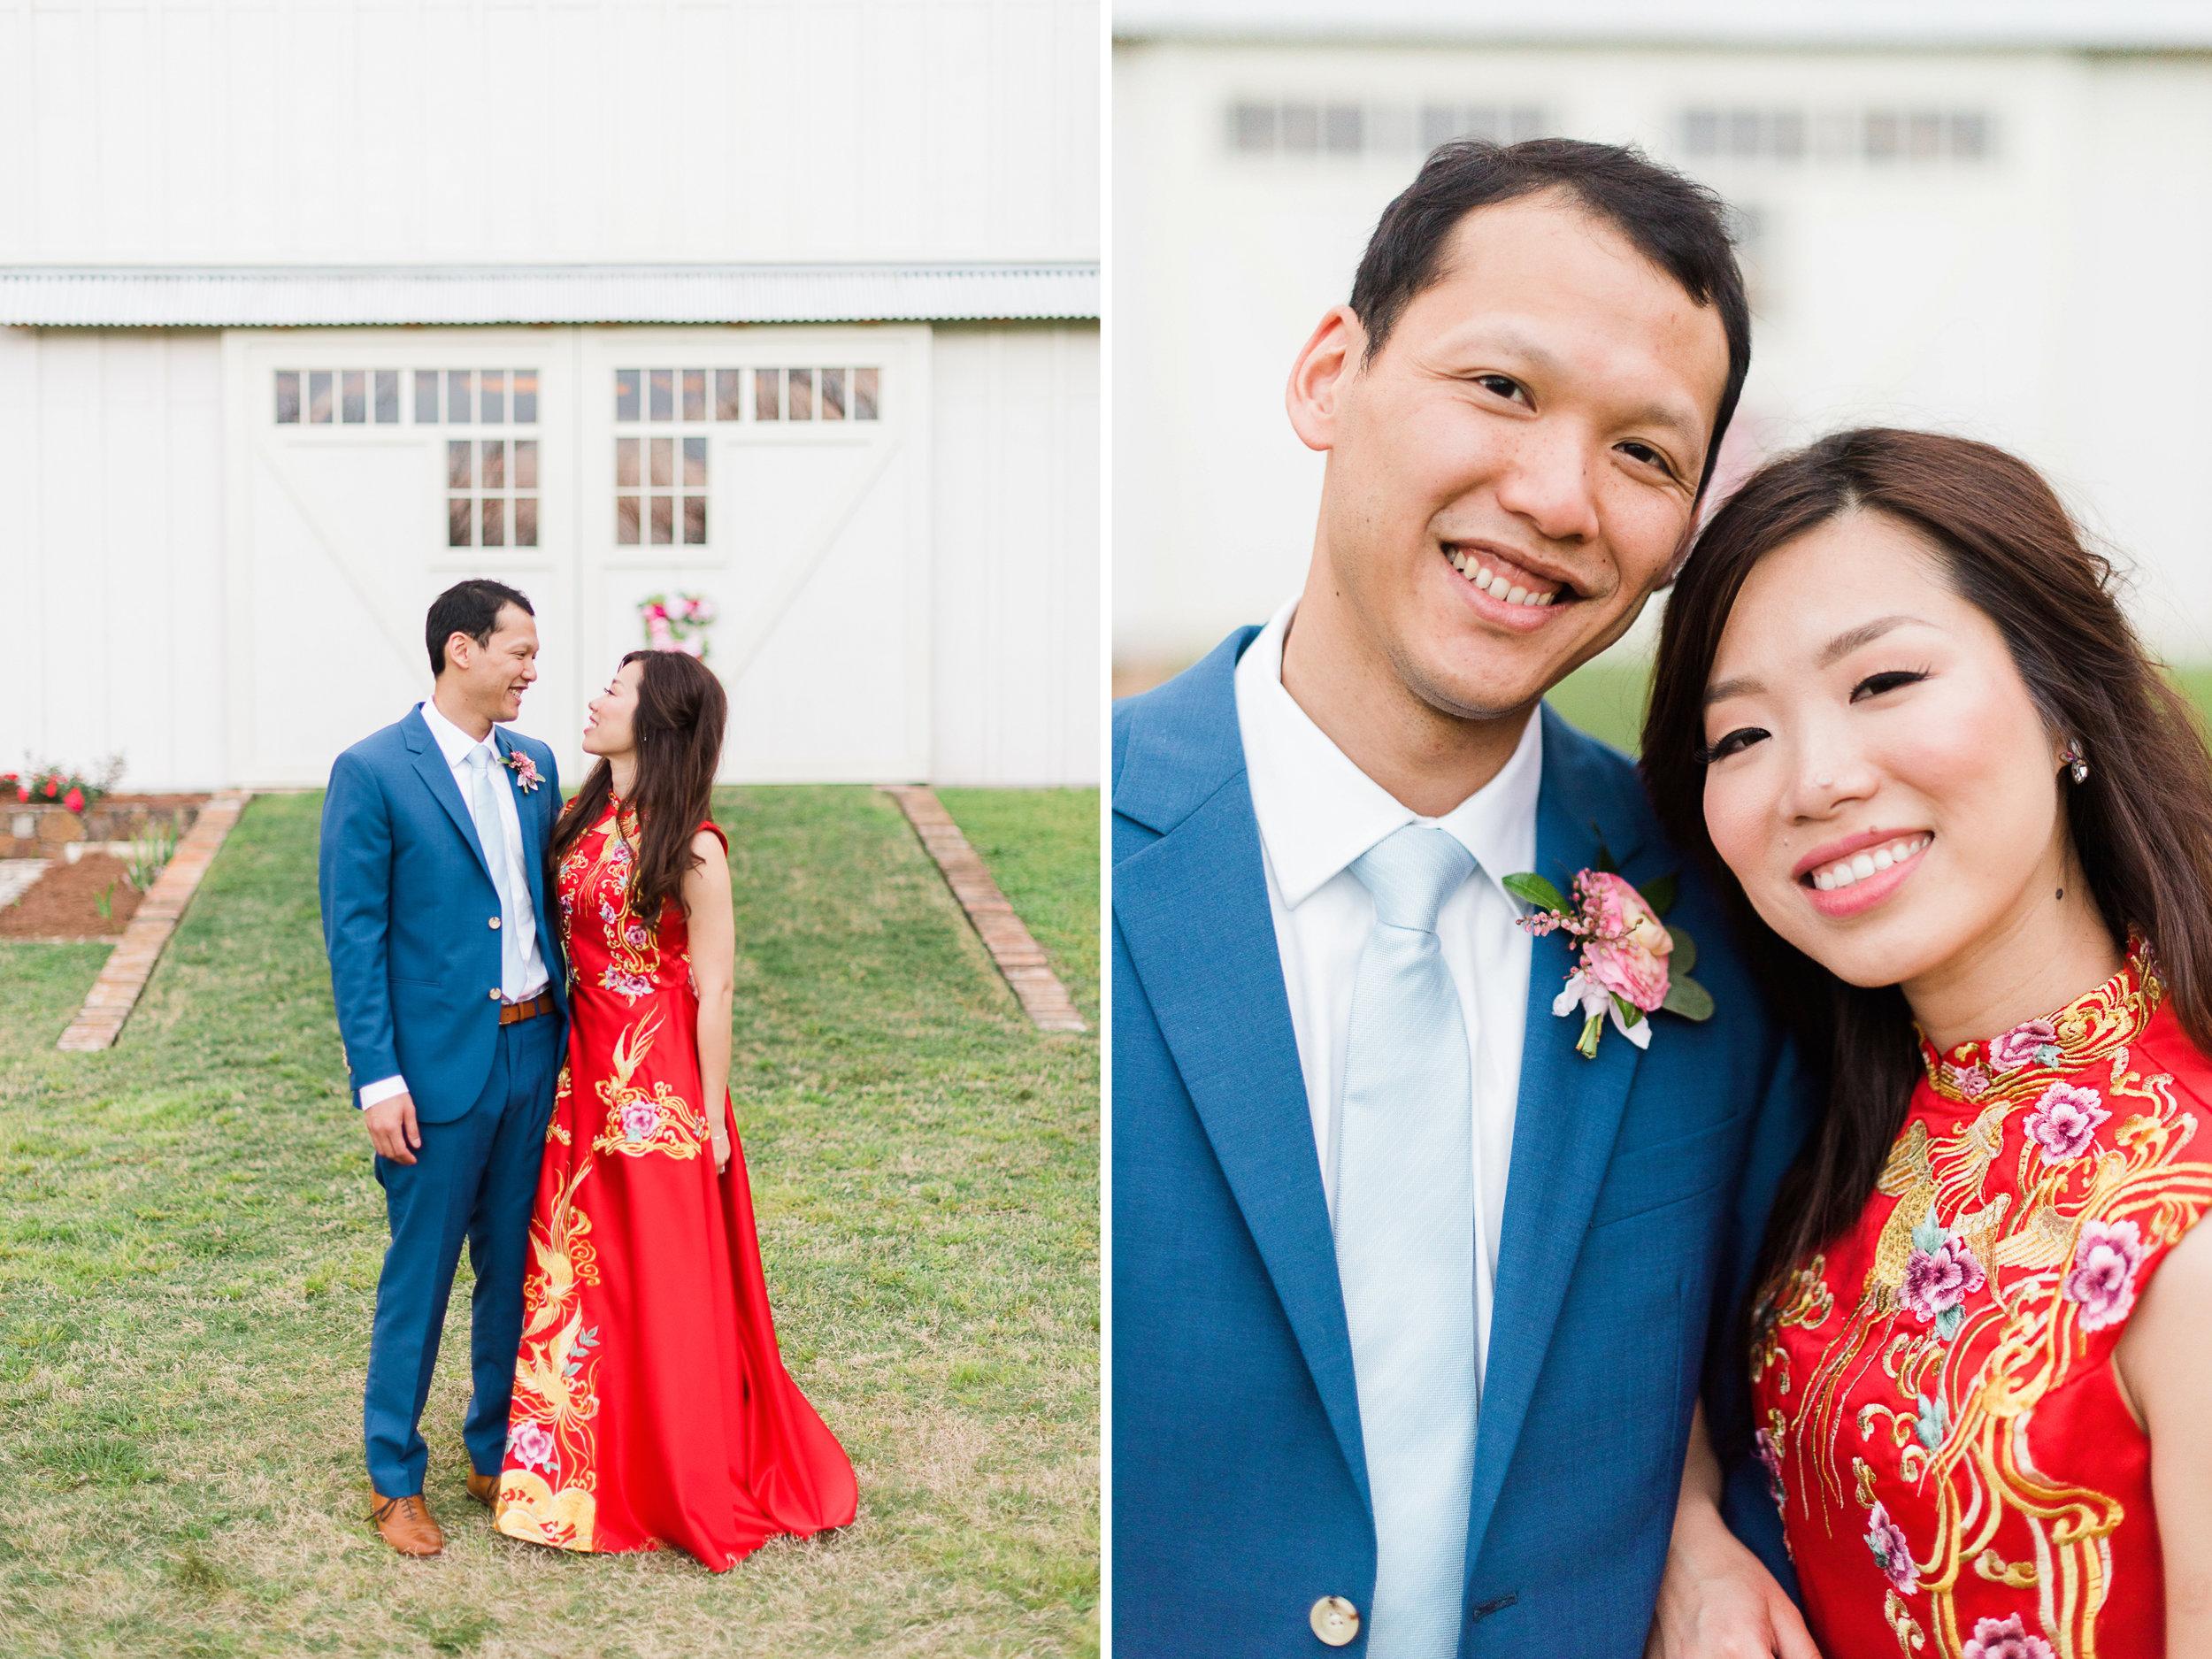 The-Knot-50-Weddings-50-States-Texas-Winner-Dana-Fernandez-photography-houston-wedding-photographer-film-fine-art-destination-141.jpg